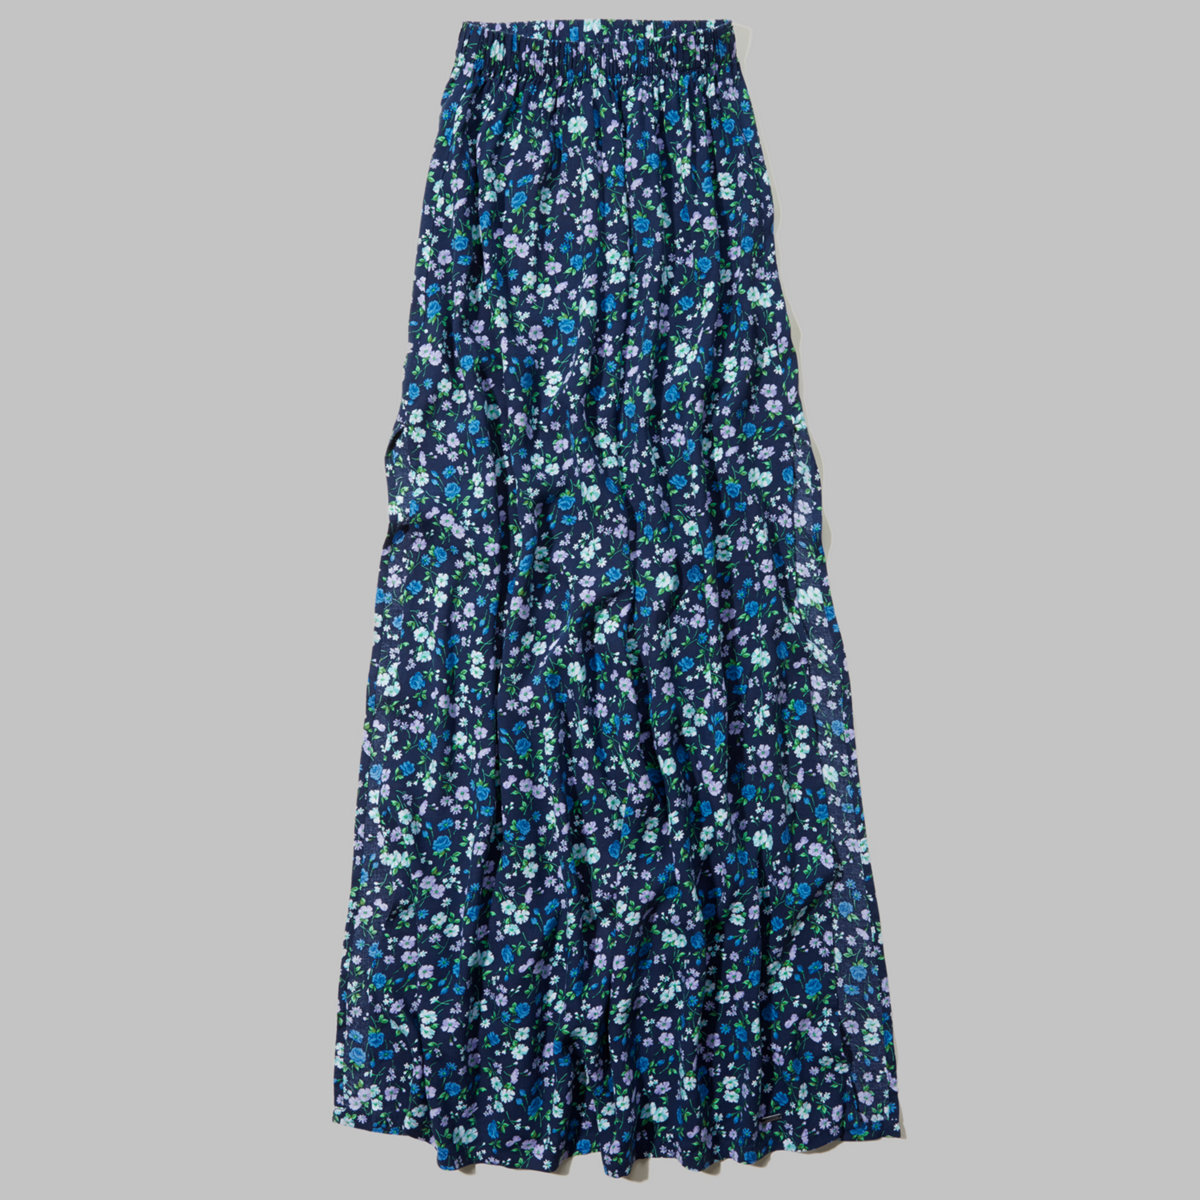 Marina Park Maxi Skirt